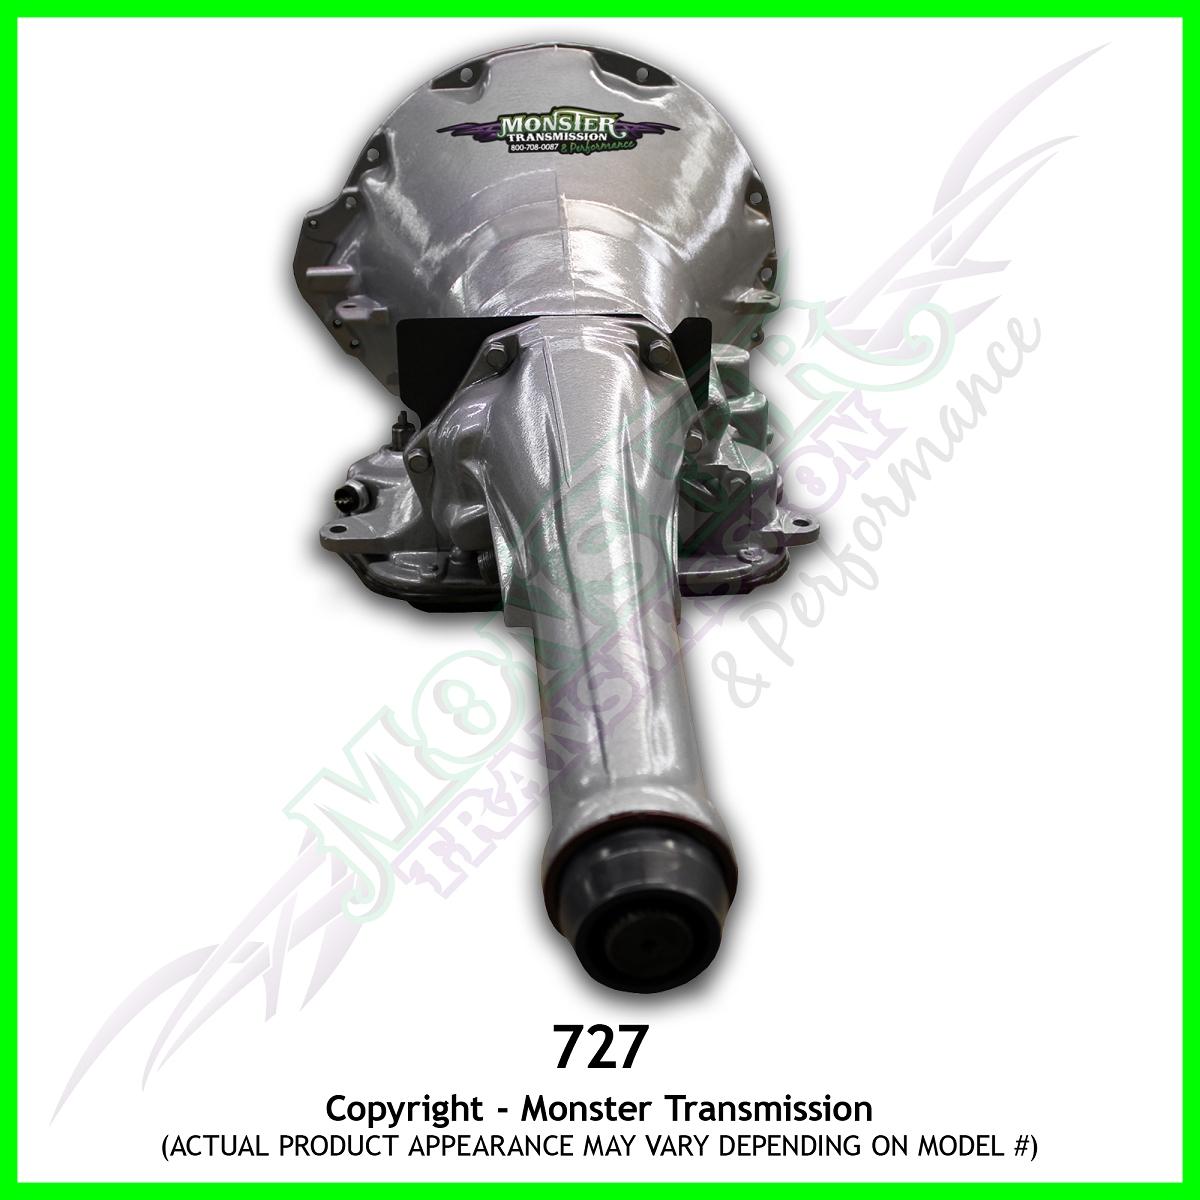 1965 727 Torqueflite Transmission Diagram Quick Start Guide Of Chrysler Neutral Safety Switch Wiring 46re Mercruiser Fatsco